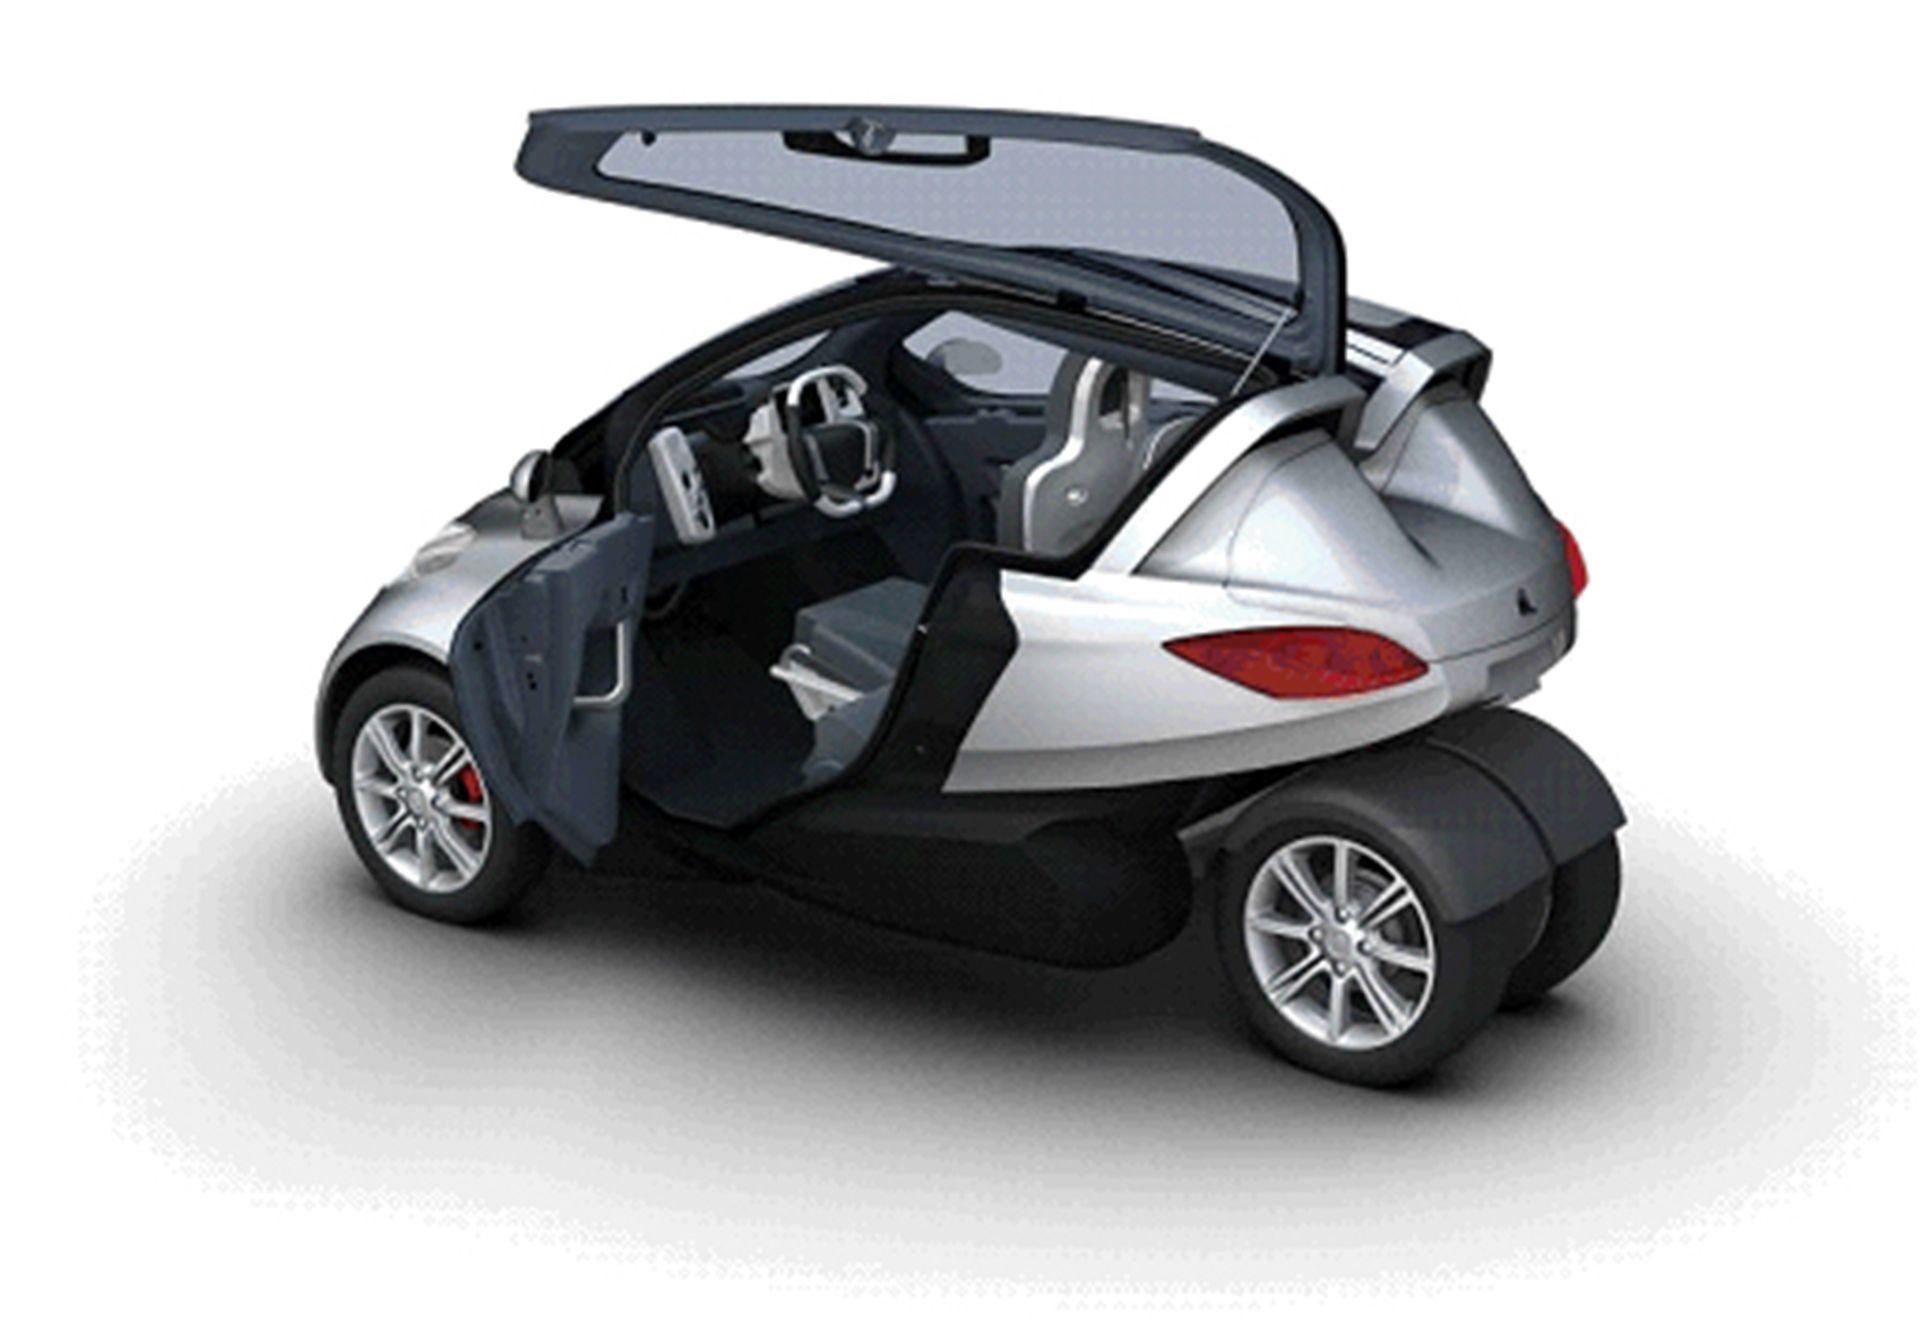 PSA Peugeot Citroën presents its light city electric